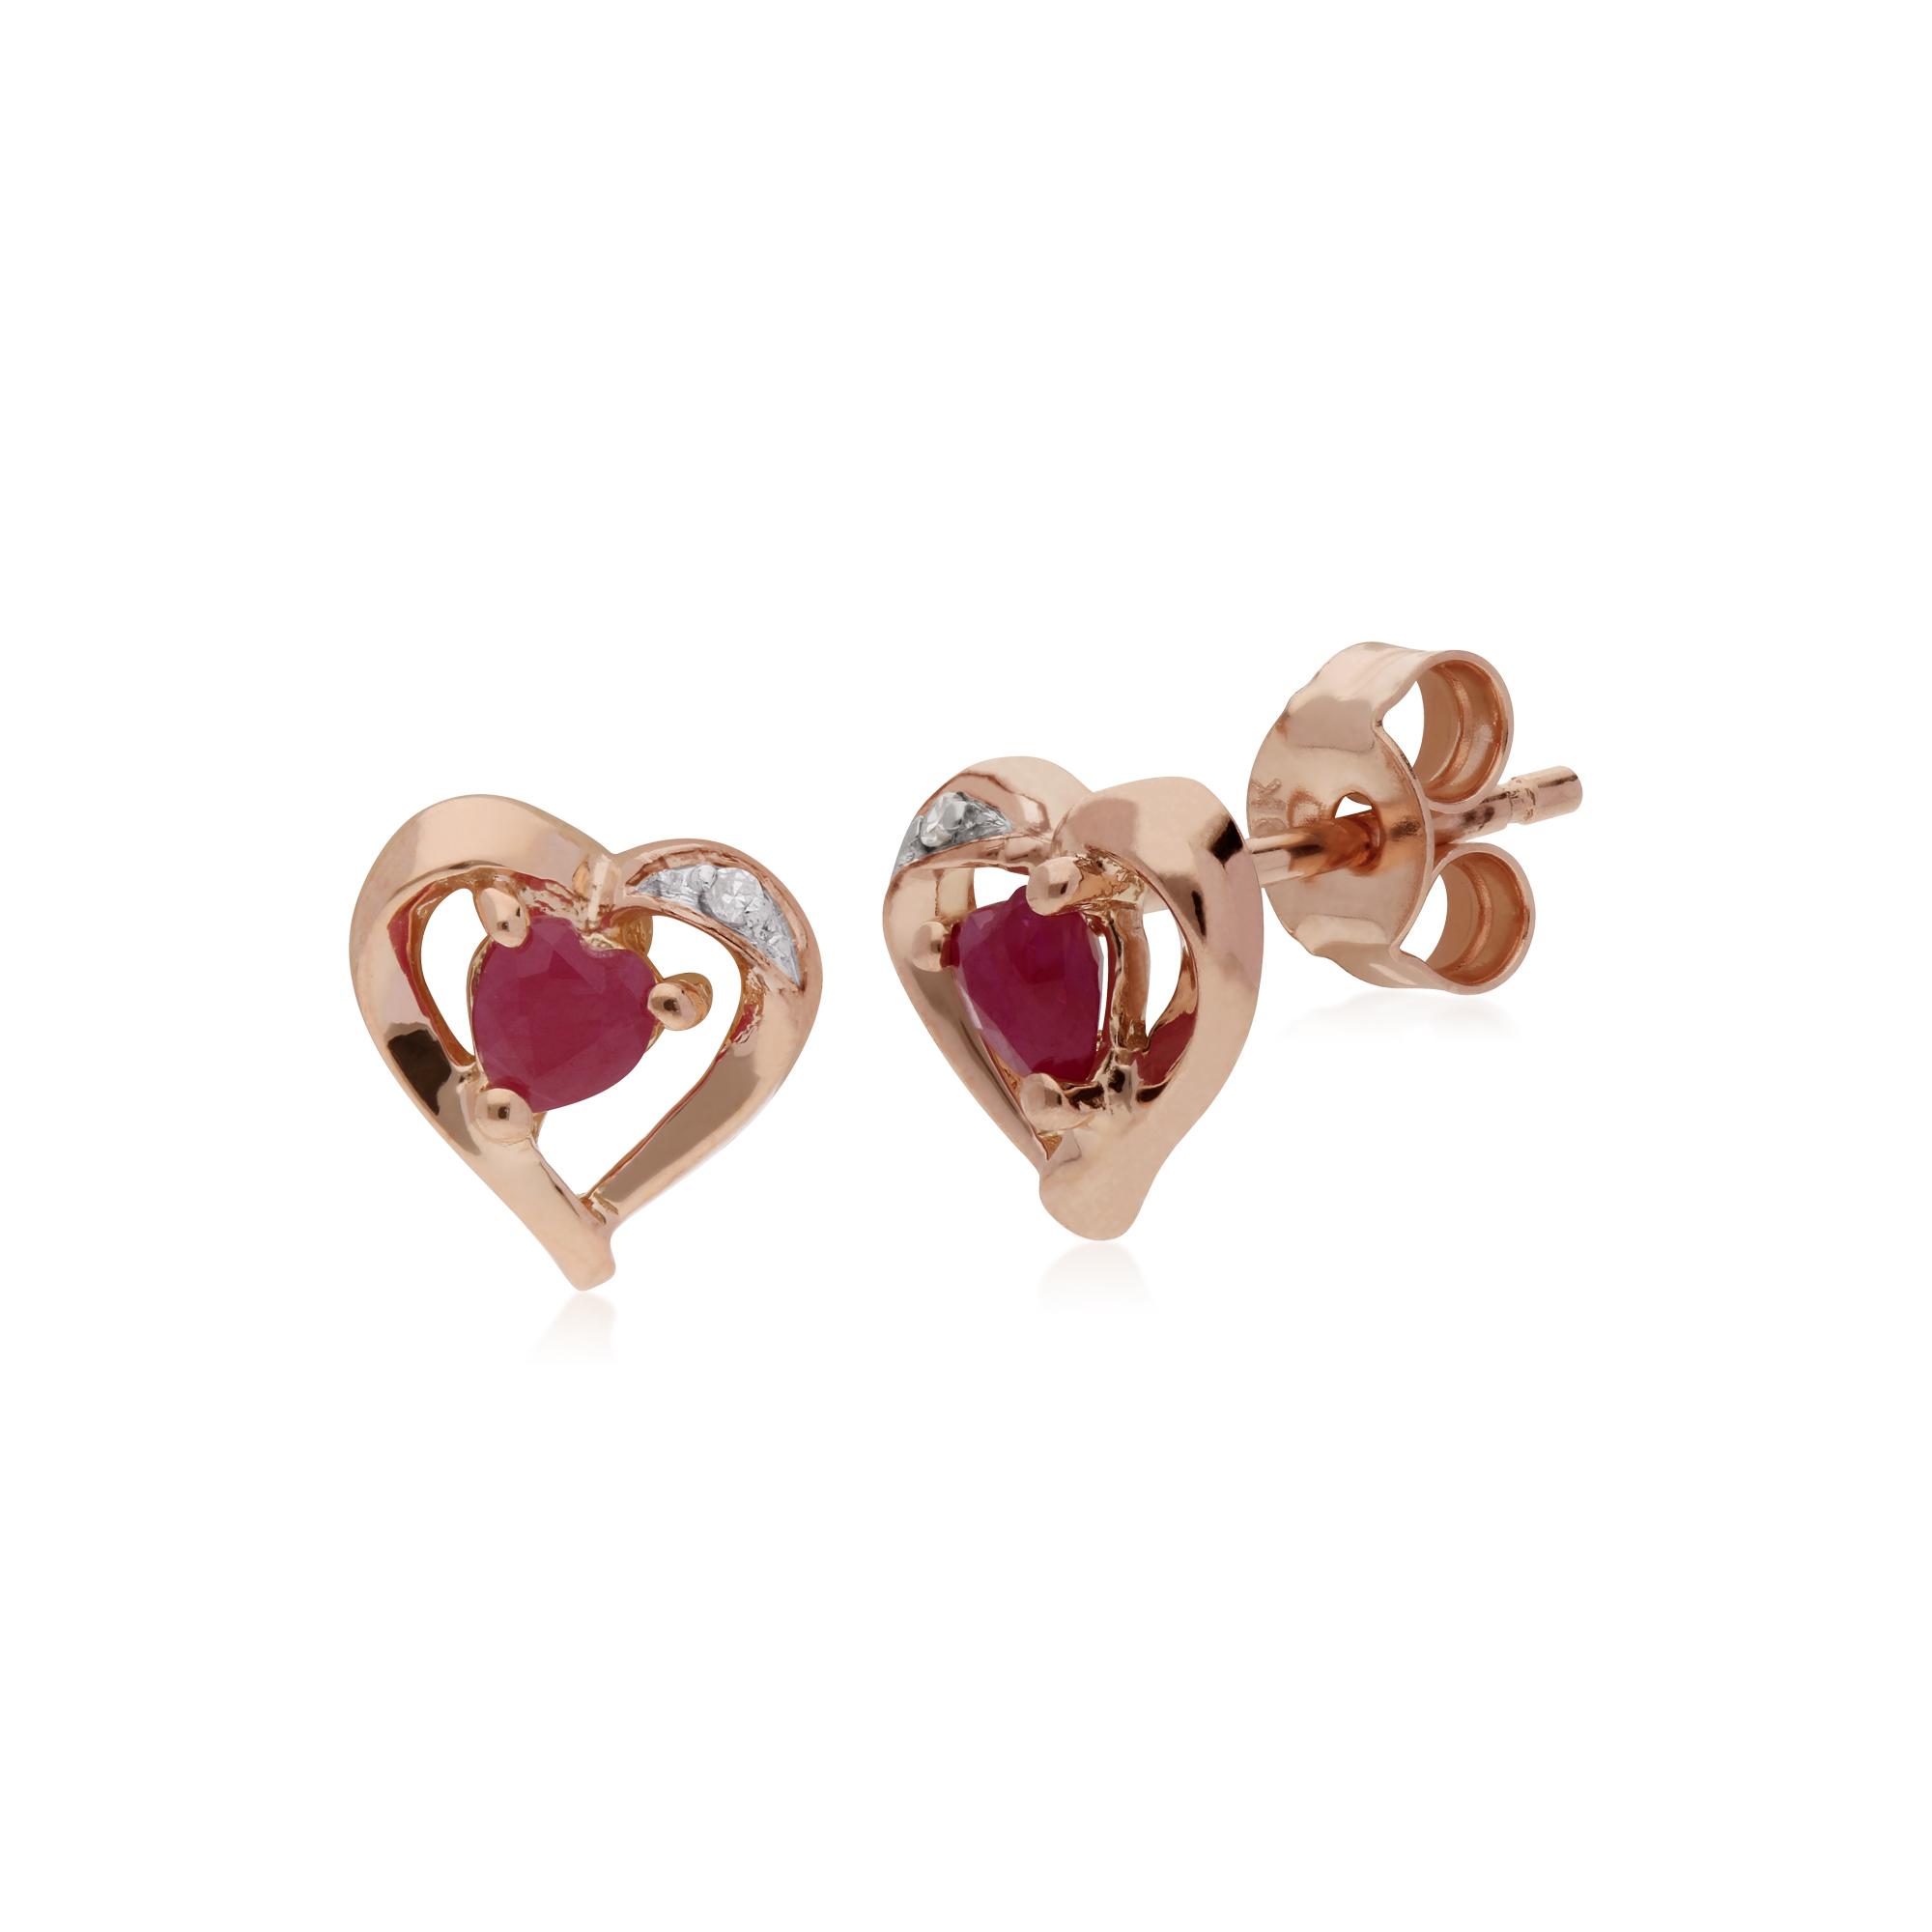 1d9985e6d Gemondo 9ct Rose Gold Natural Ruby & Diamond Heart Stud Earrings. Item SKU:  135E1493019